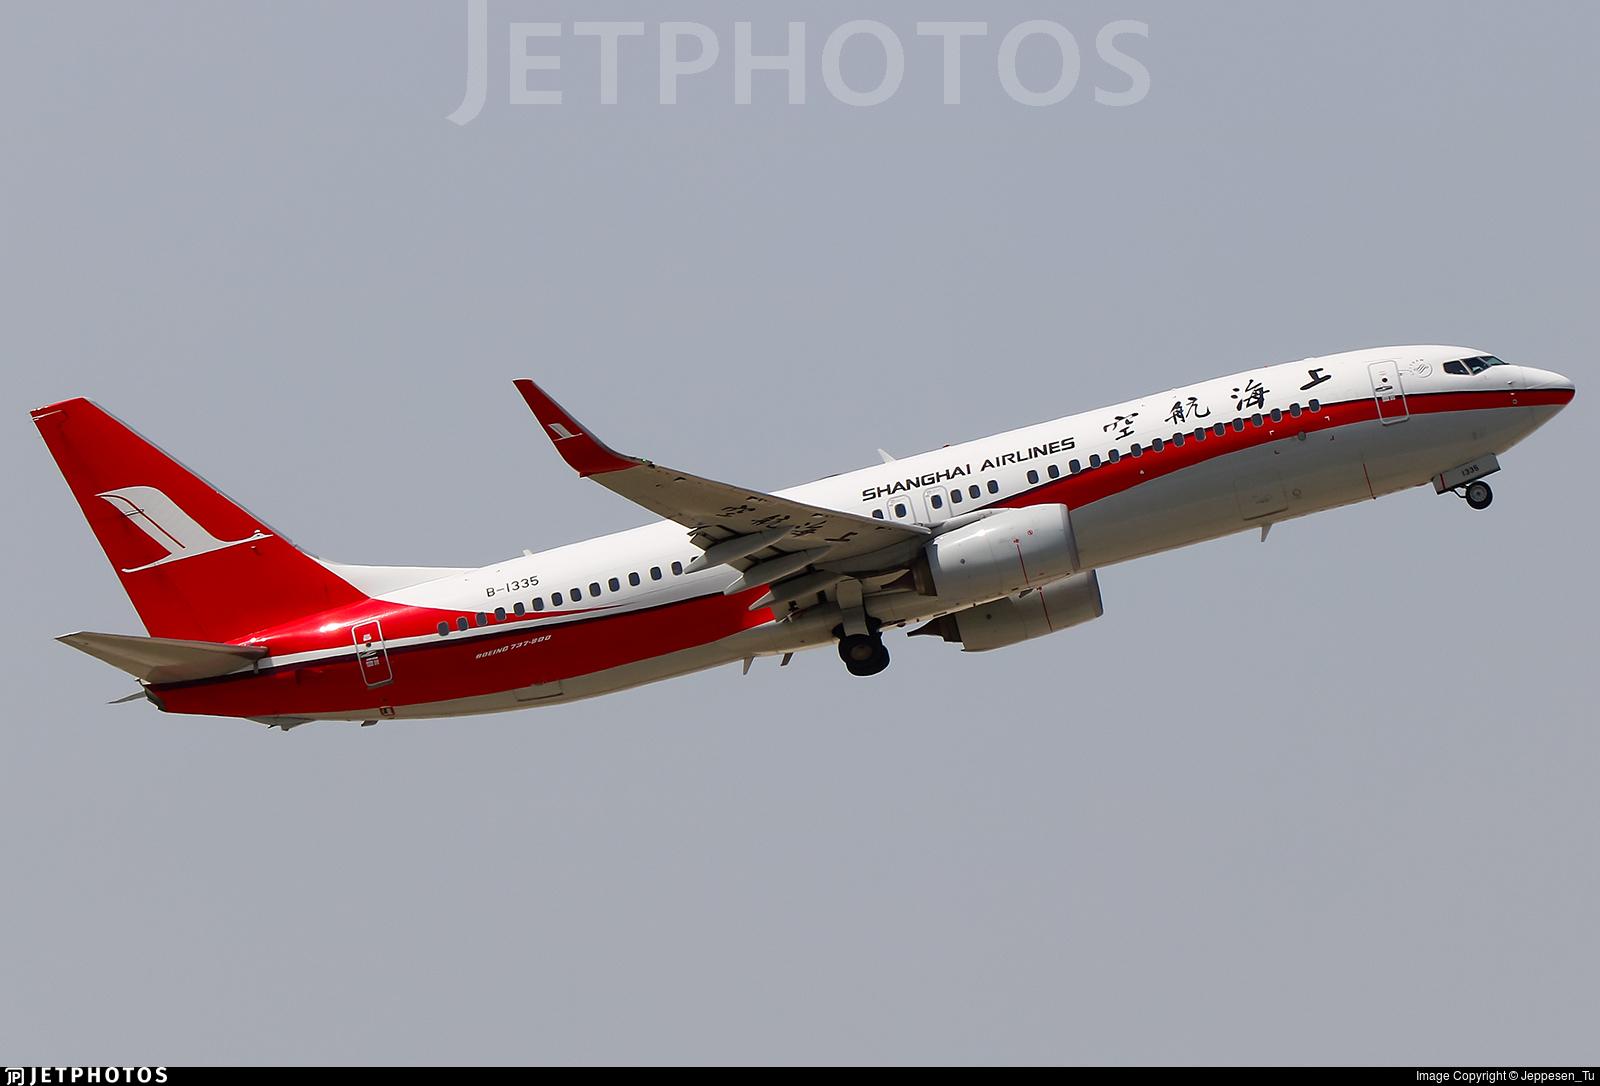 B-1335 - Boeing 737-89P - Shanghai Airlines